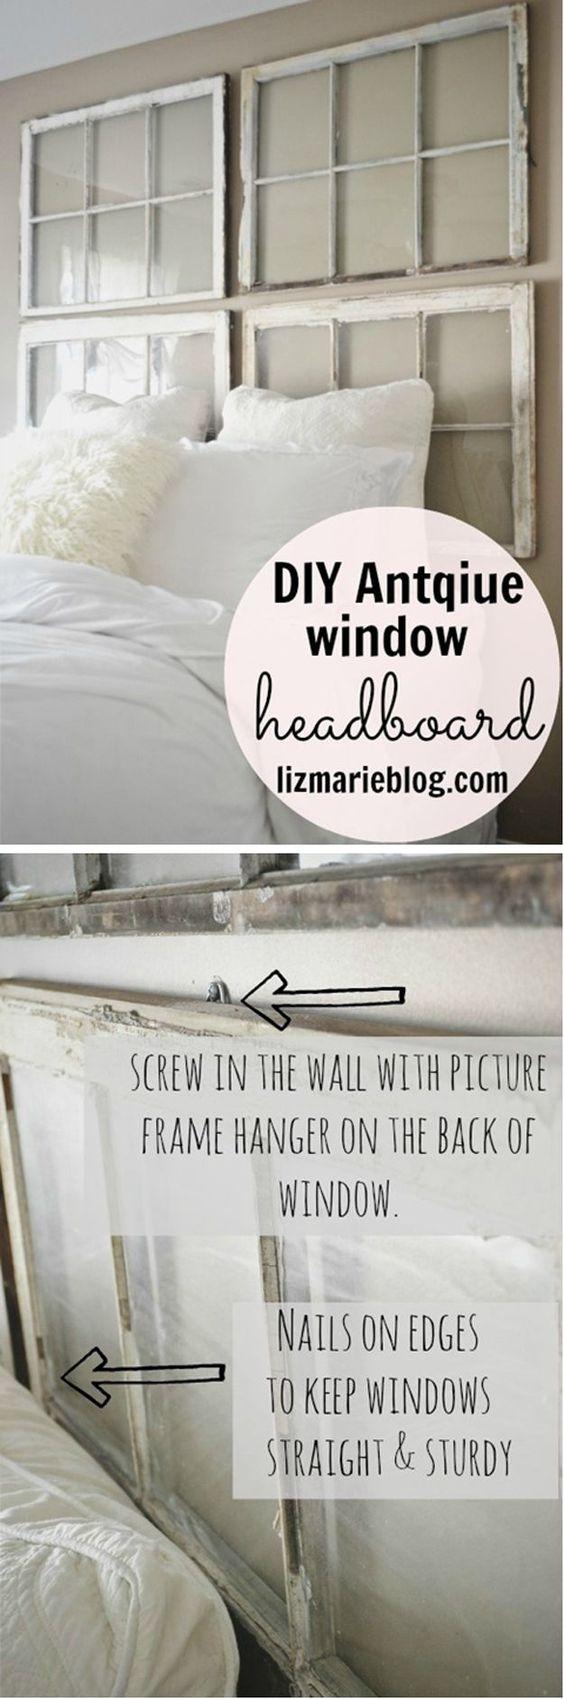 Window Headboard Tutorial | DIY Antique Window Headboard by DIY Ready at http://diyready.com/diy-headboards-for-every-home/